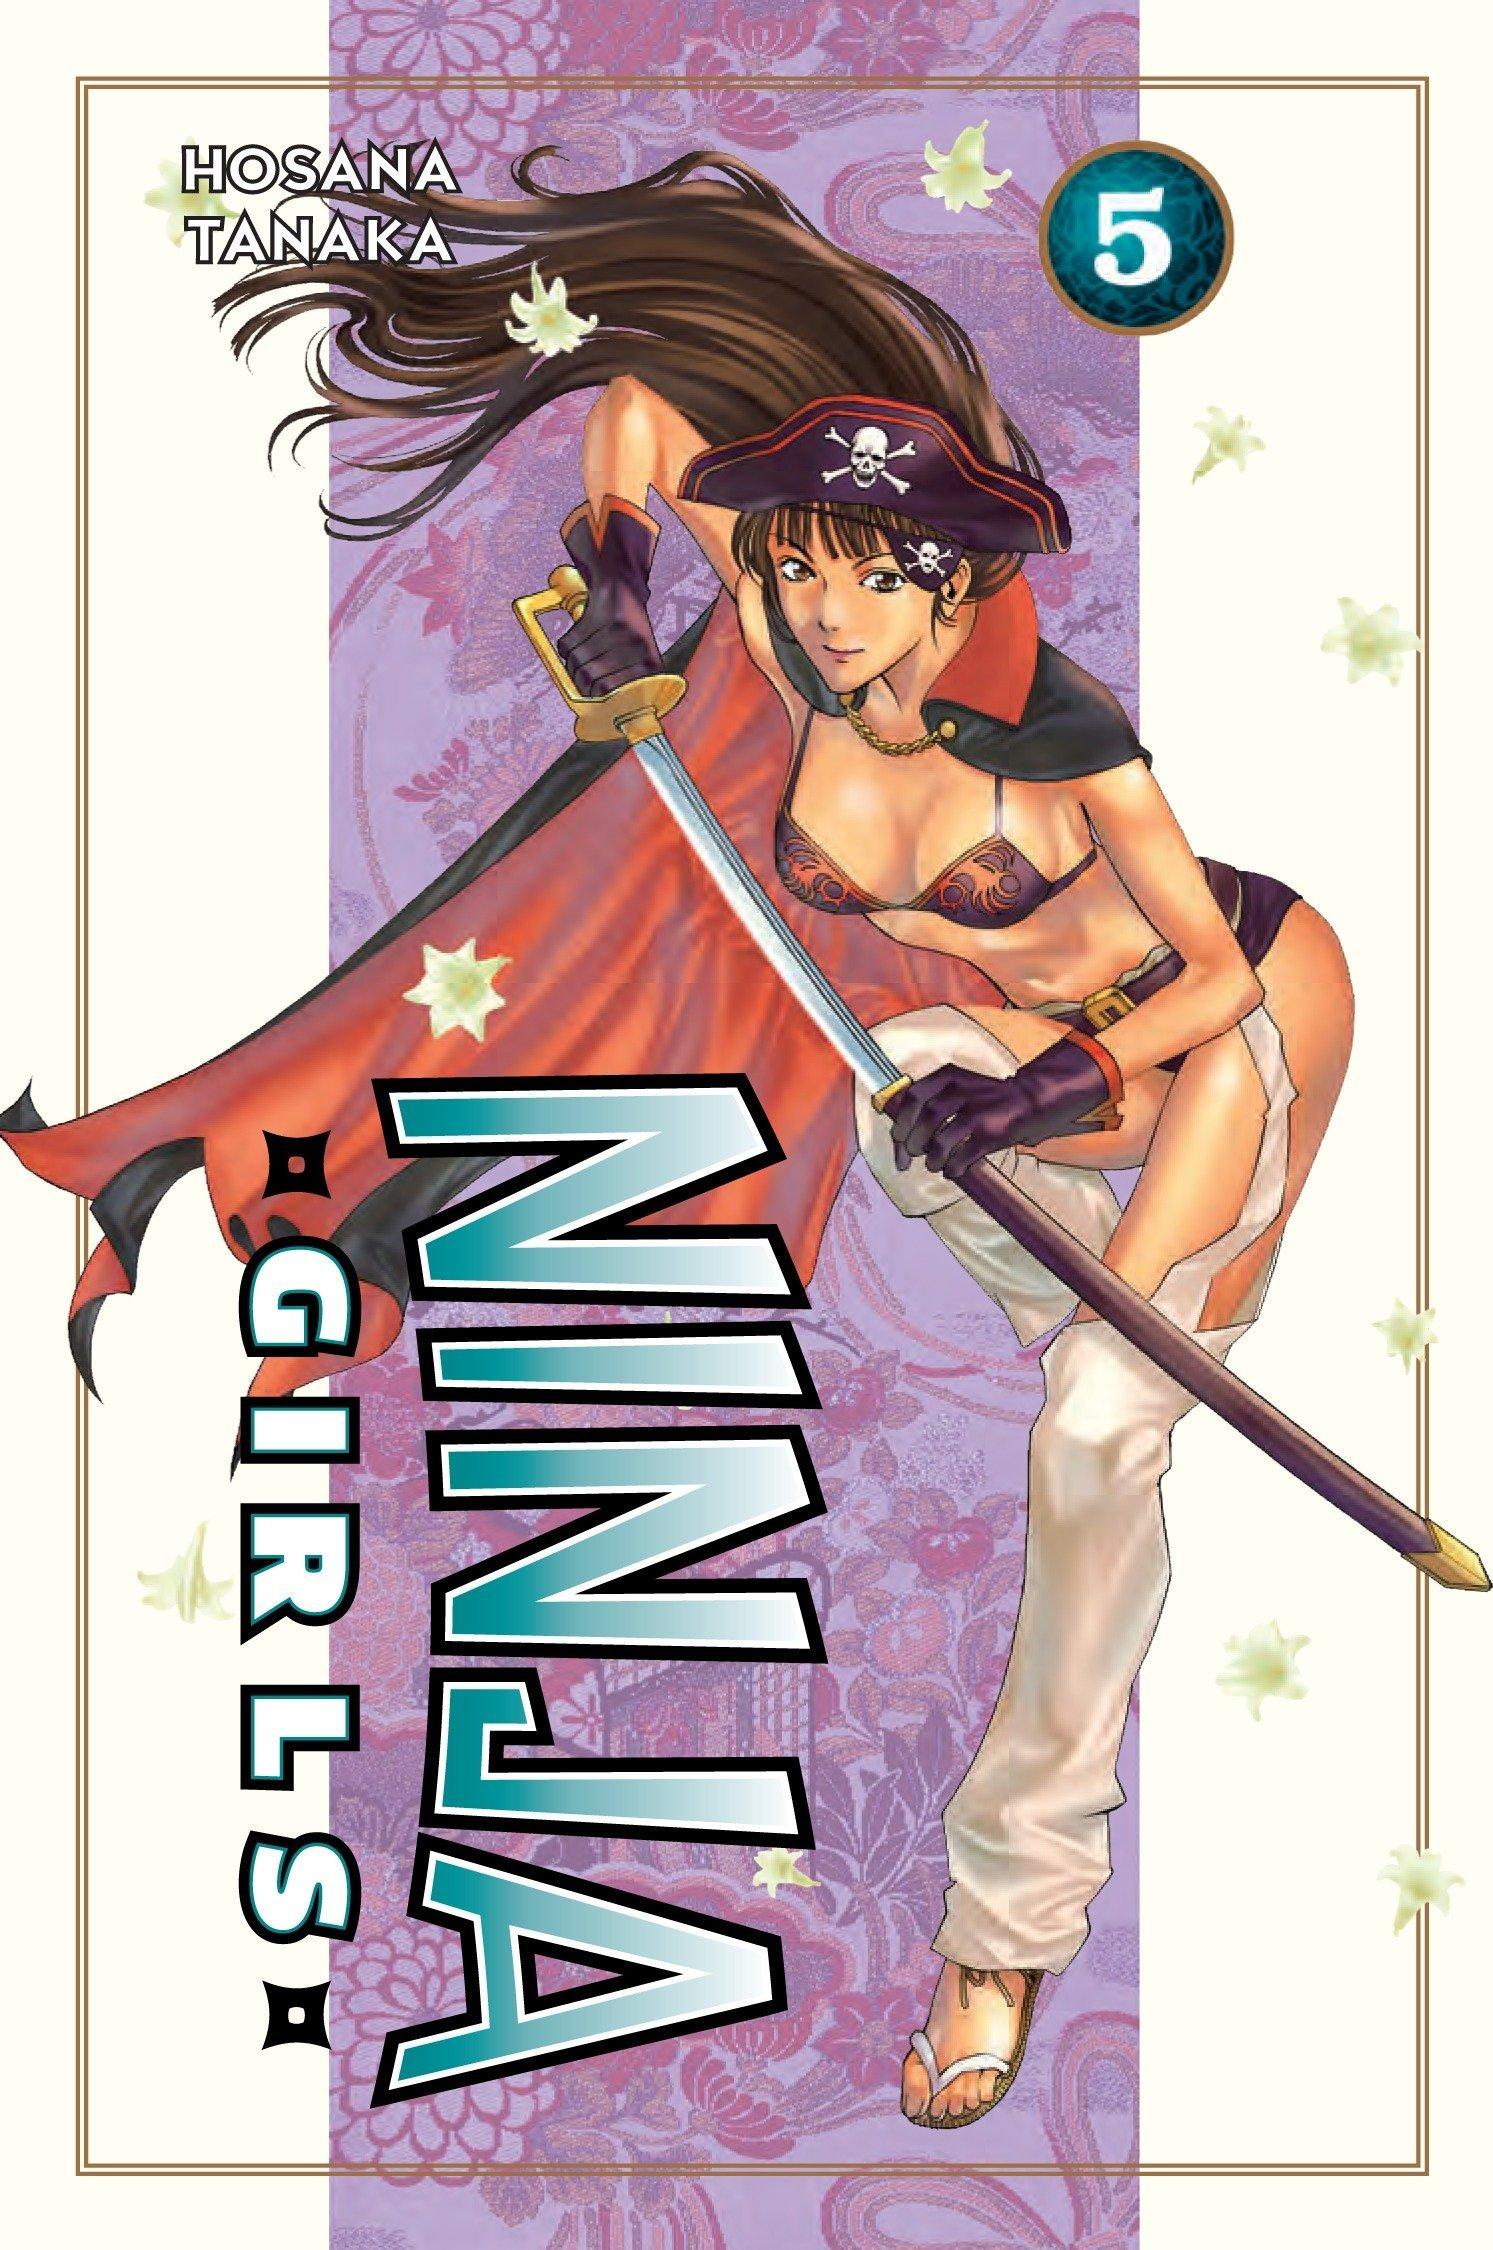 Ninja Girls 5: Amazon.es: Hosana Tanaka: Libros en idiomas ...